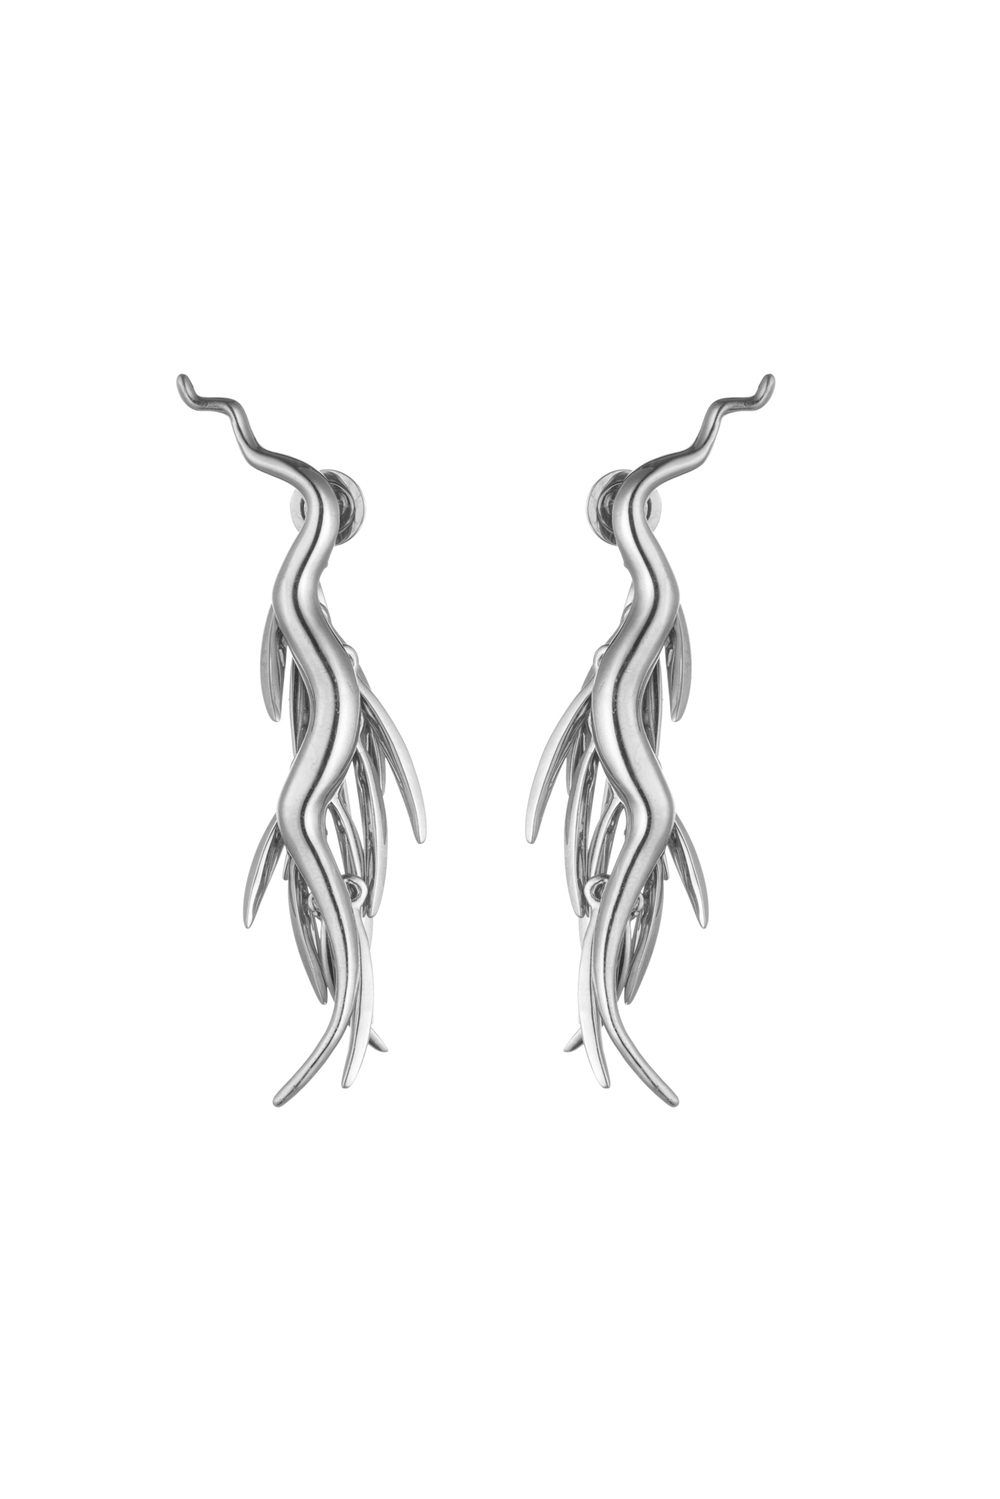 05-04-accessories-trends-fall-2015-modern-metal.jpg